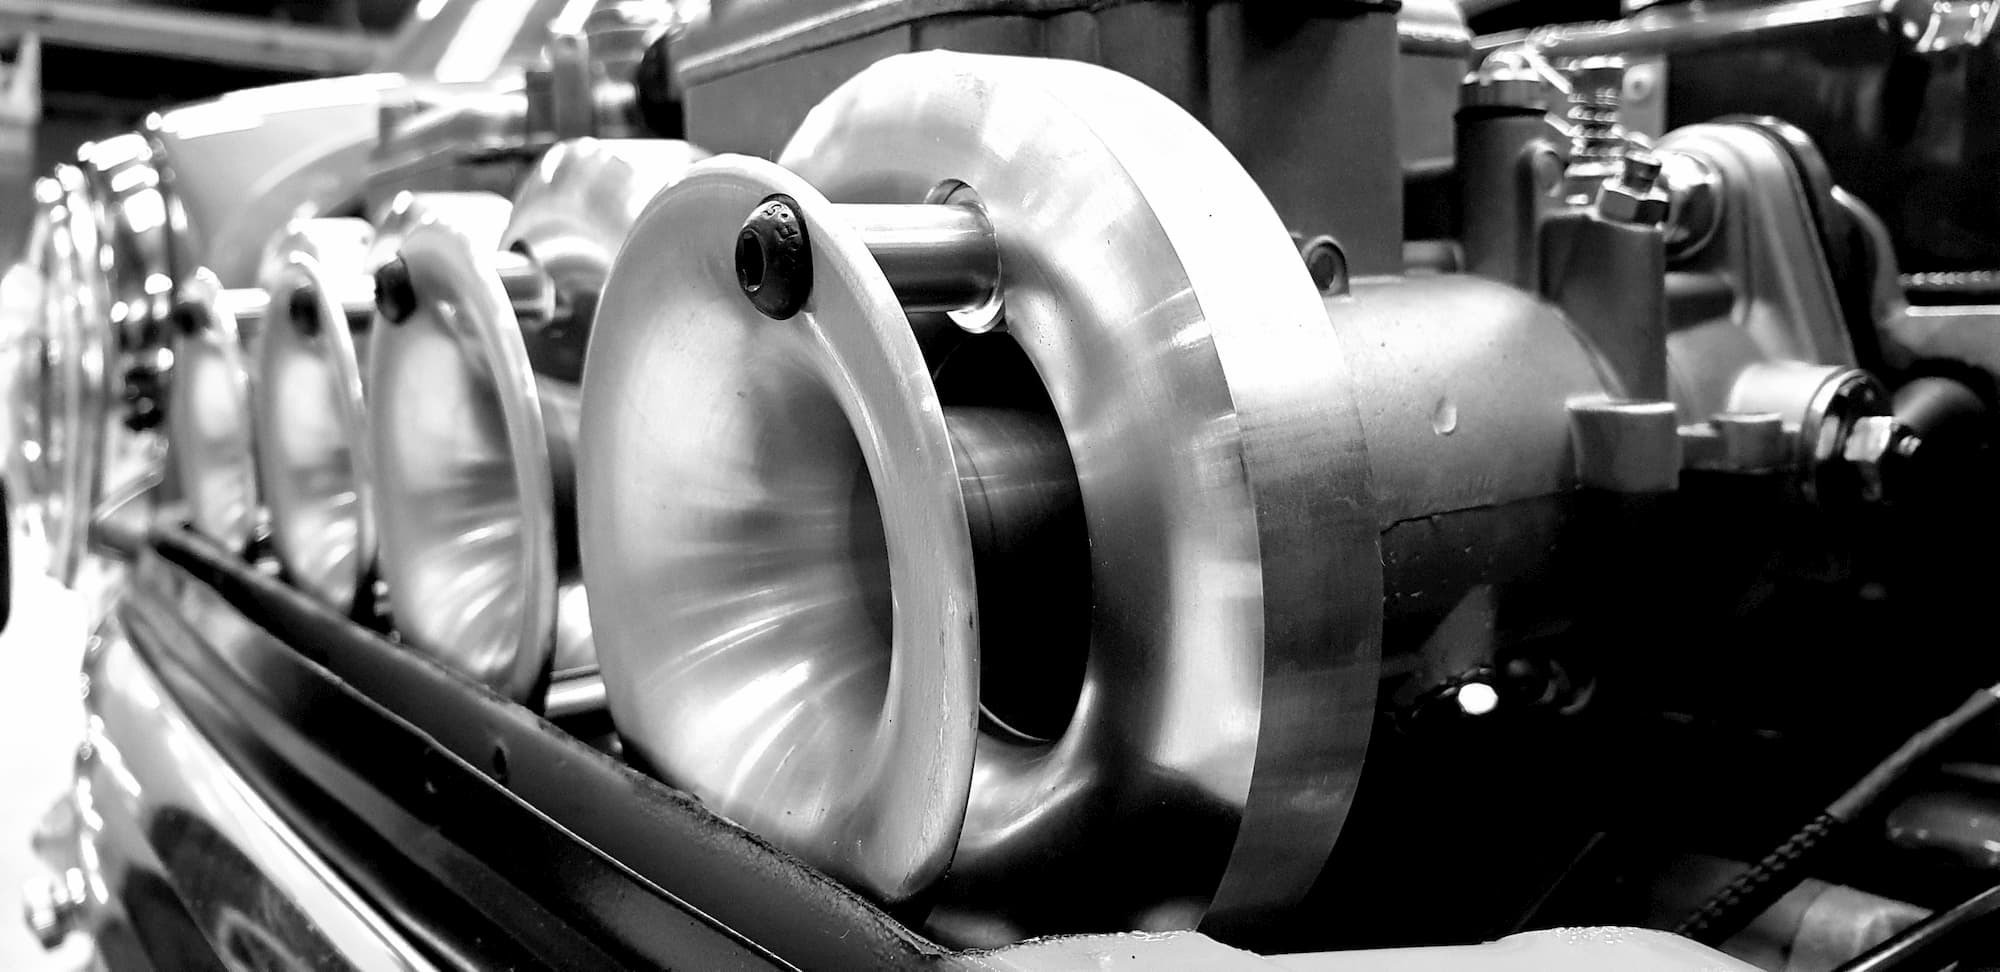 Culasse Arden de la Mini Austin MK2 - Arden Cylinder Head